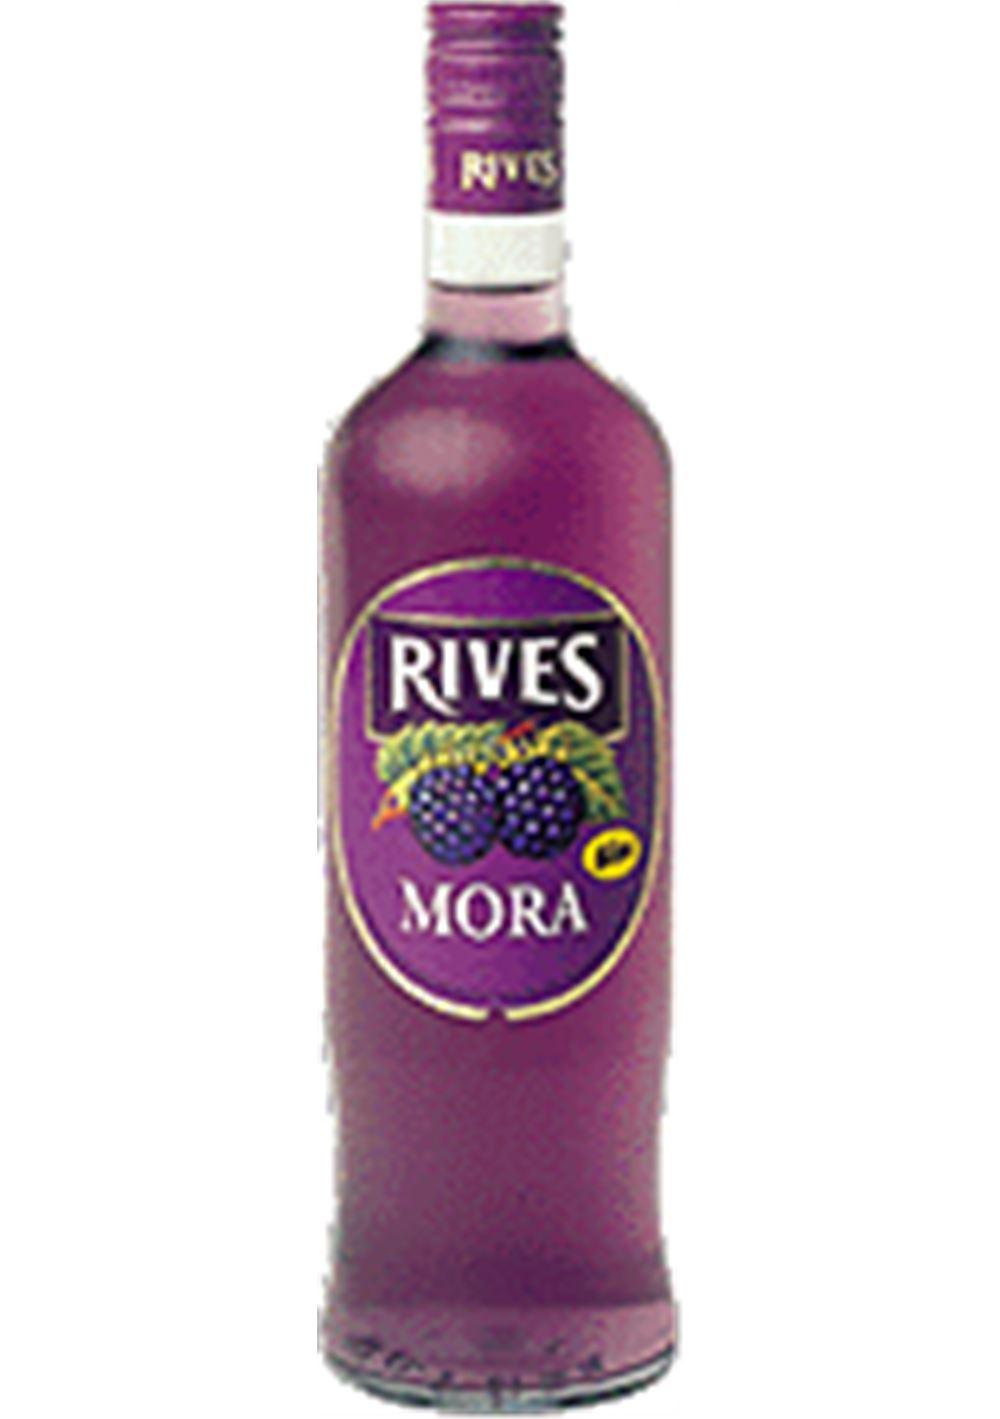 RIVES MORA SIN ALCOHOL